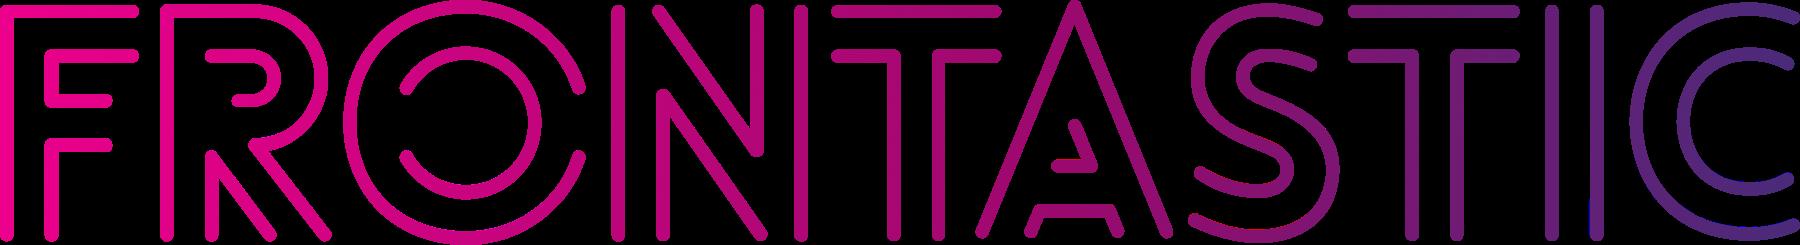 frontastic logo